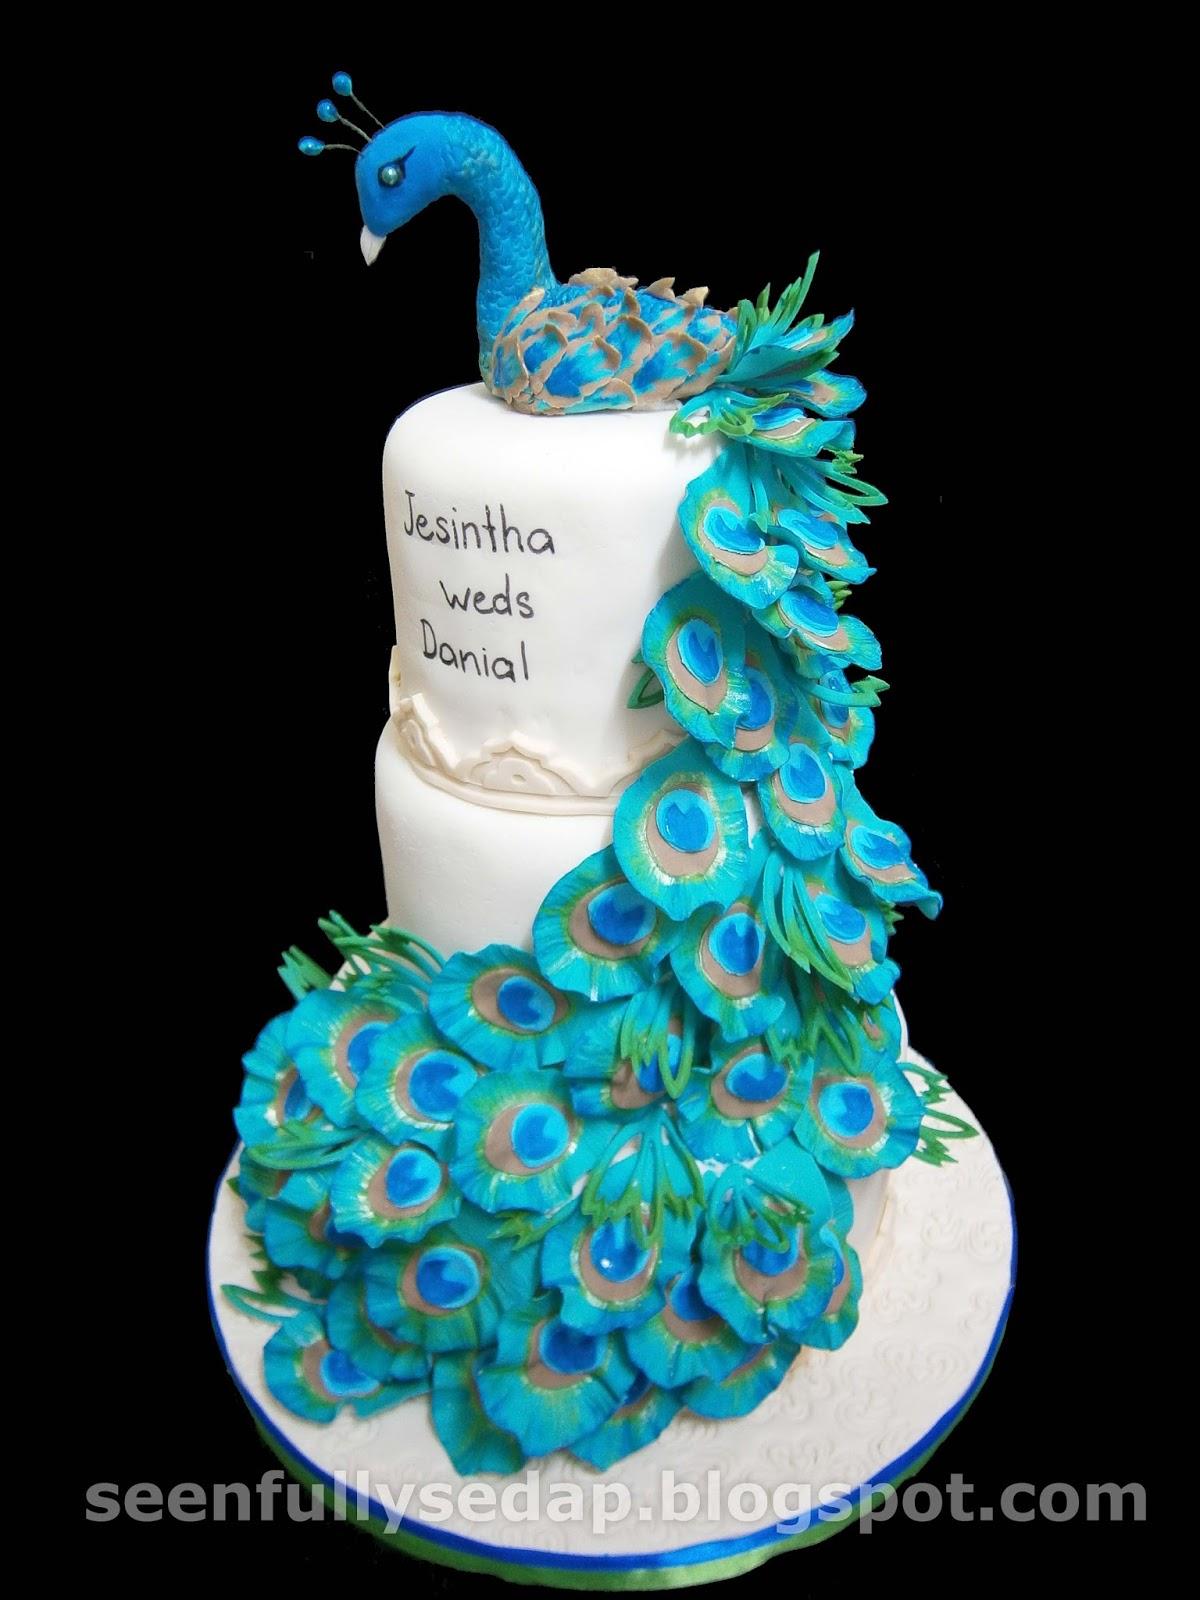 Seenfully Sedap Peacock Wedding Cake Jessy Dass